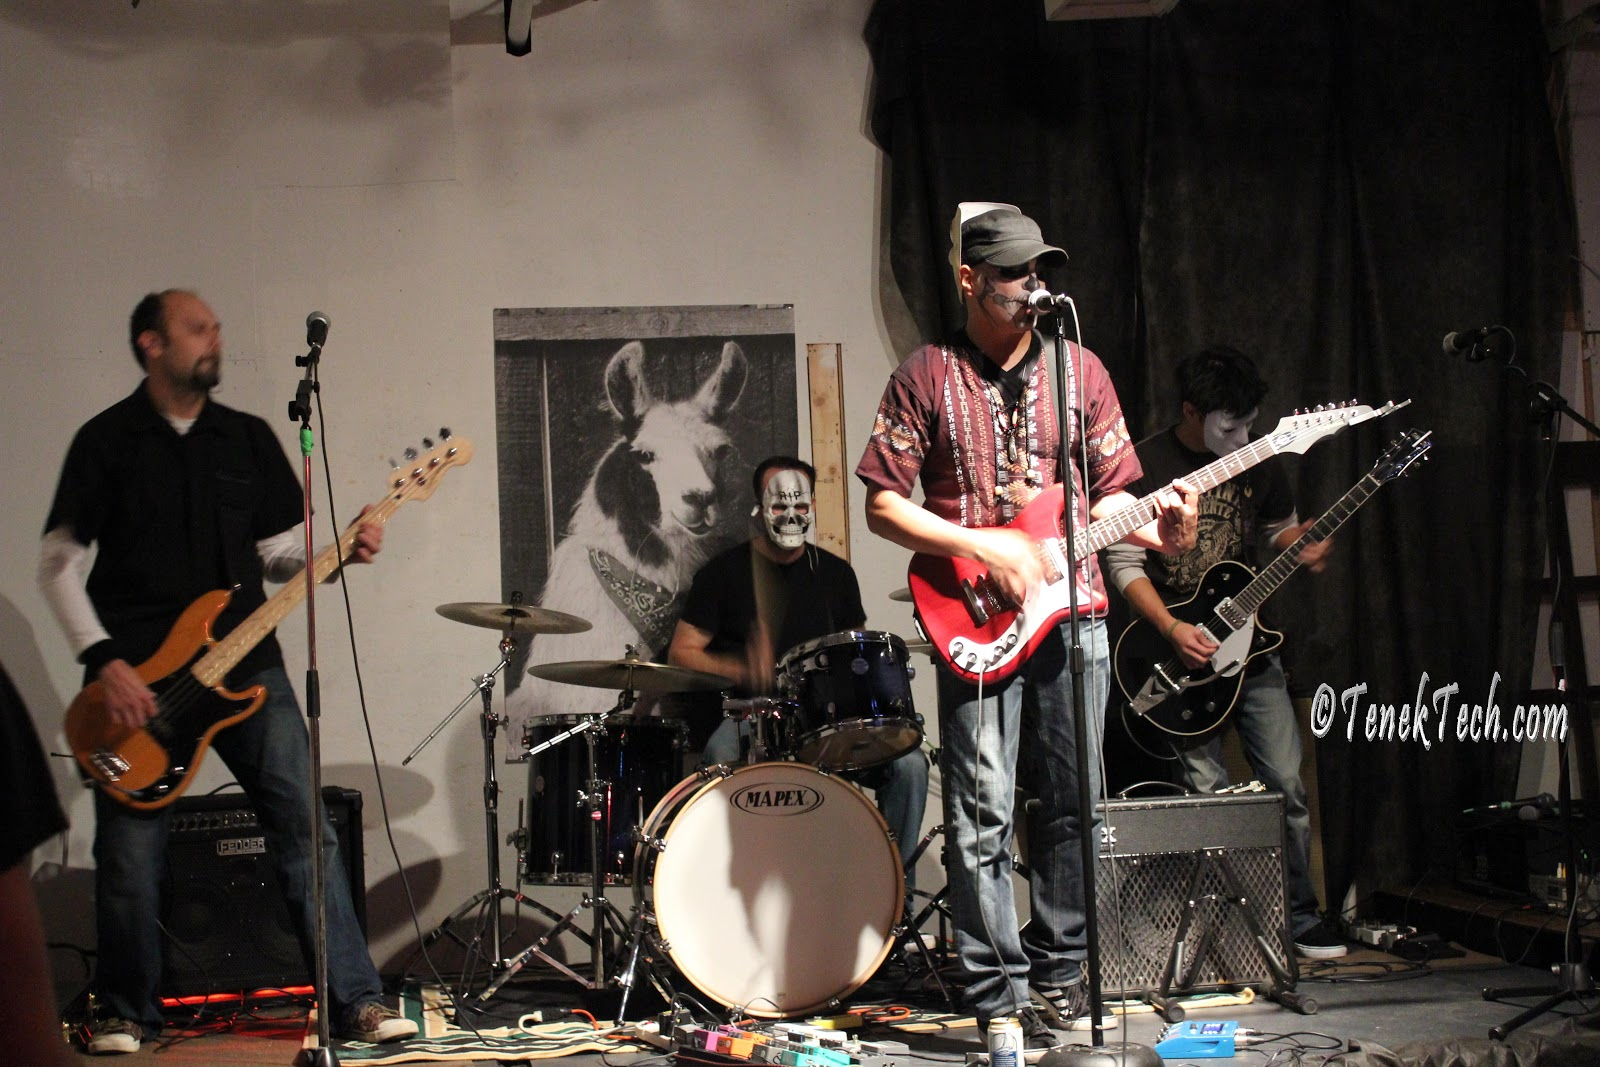 http://2.bp.blogspot.com/-lrzpXZ4jJKI/UJbfnzKTCvI/AAAAAAAACmI/tGyhFkDc880/s1600/vancouverdayofthedeadlovelustbandvanmusiccitrmusterstudios2012_11_03_9230.JPG